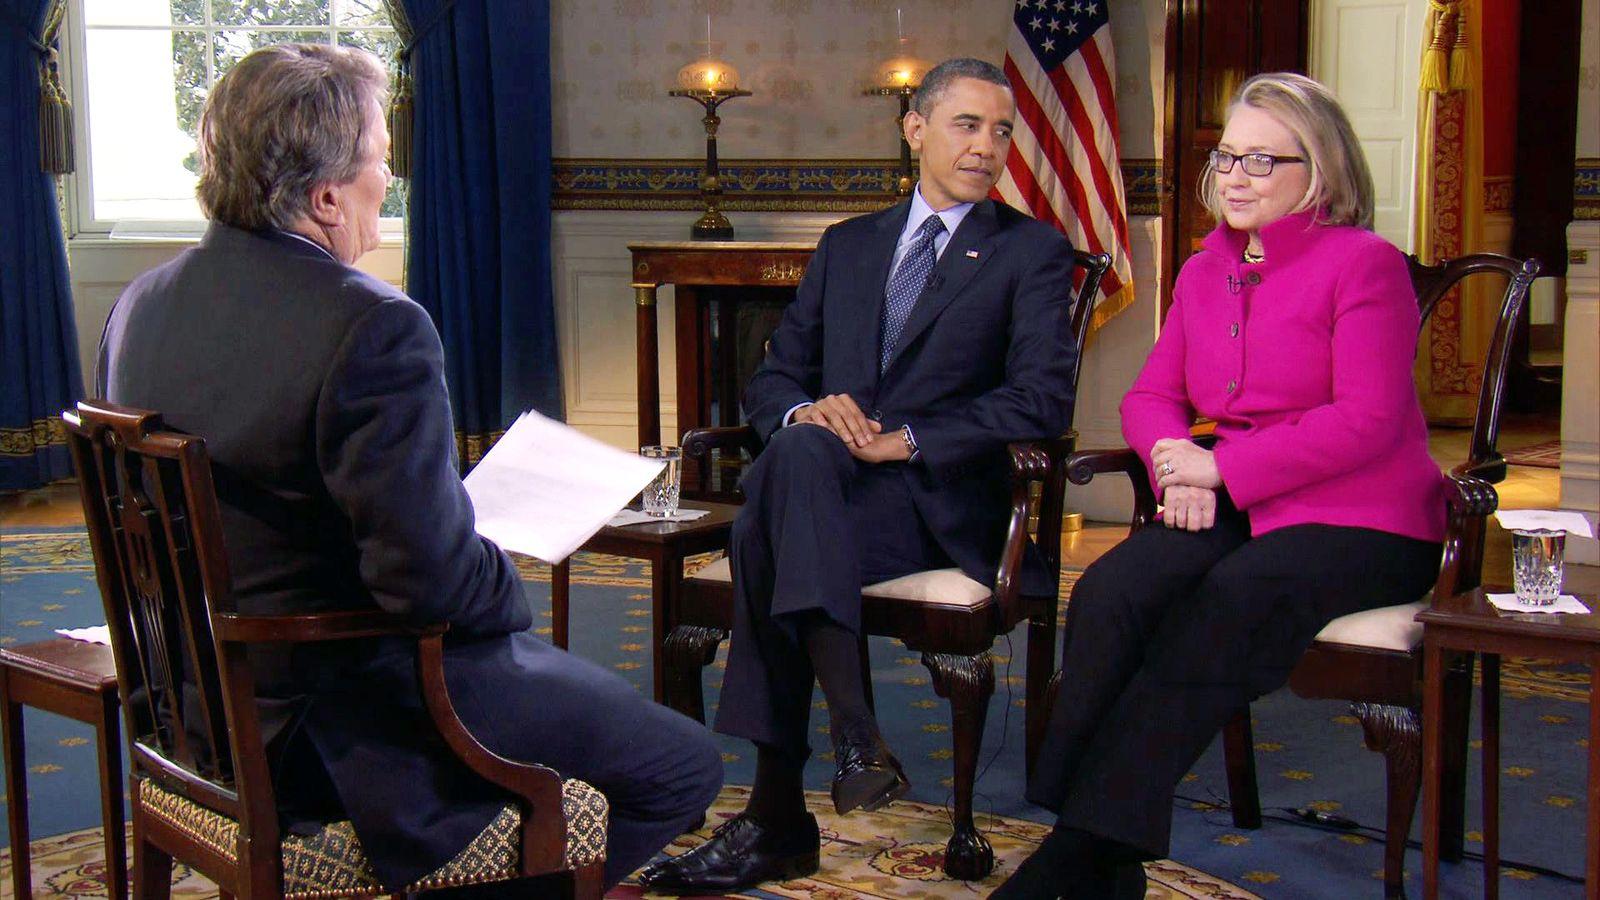 Obama/ Clinton/ CBS 60 Minutes